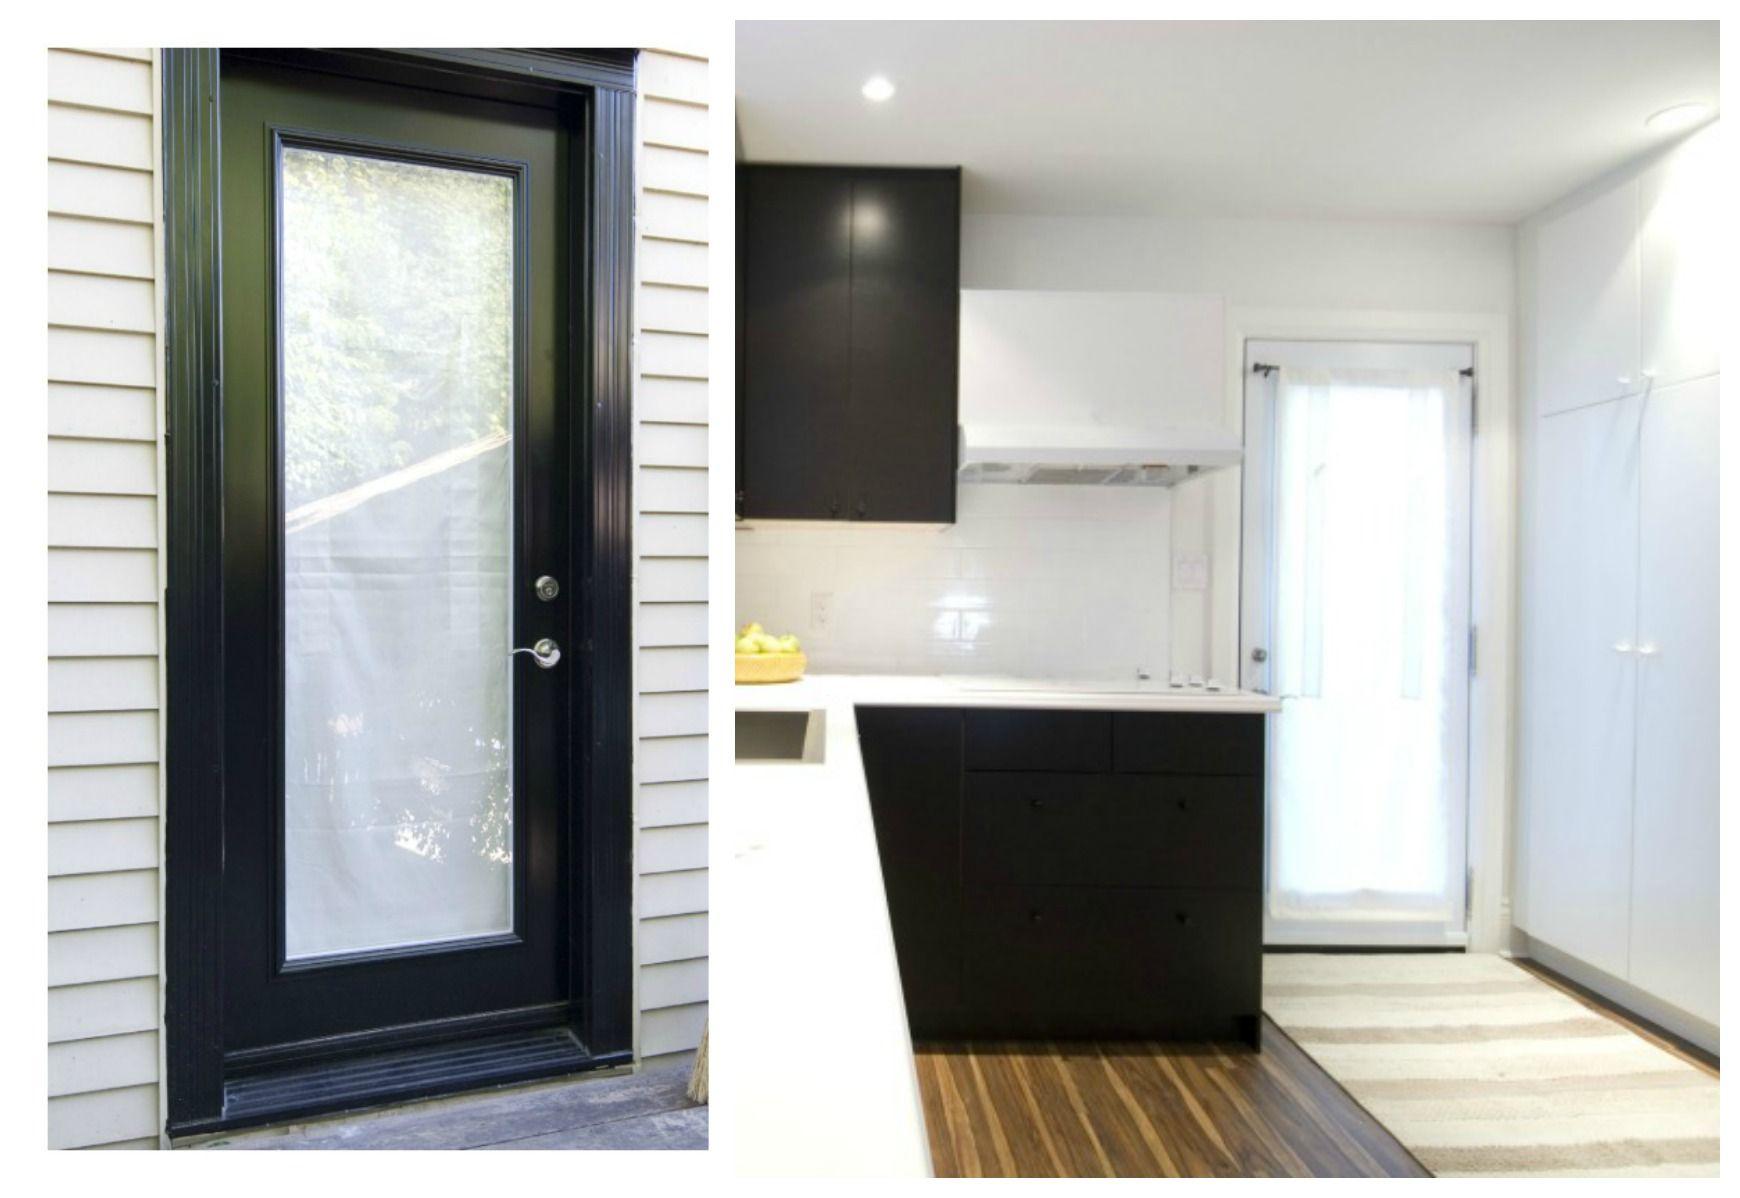 New Tru Tech Rear Entry Door Income Property Hgtv Basement Appt